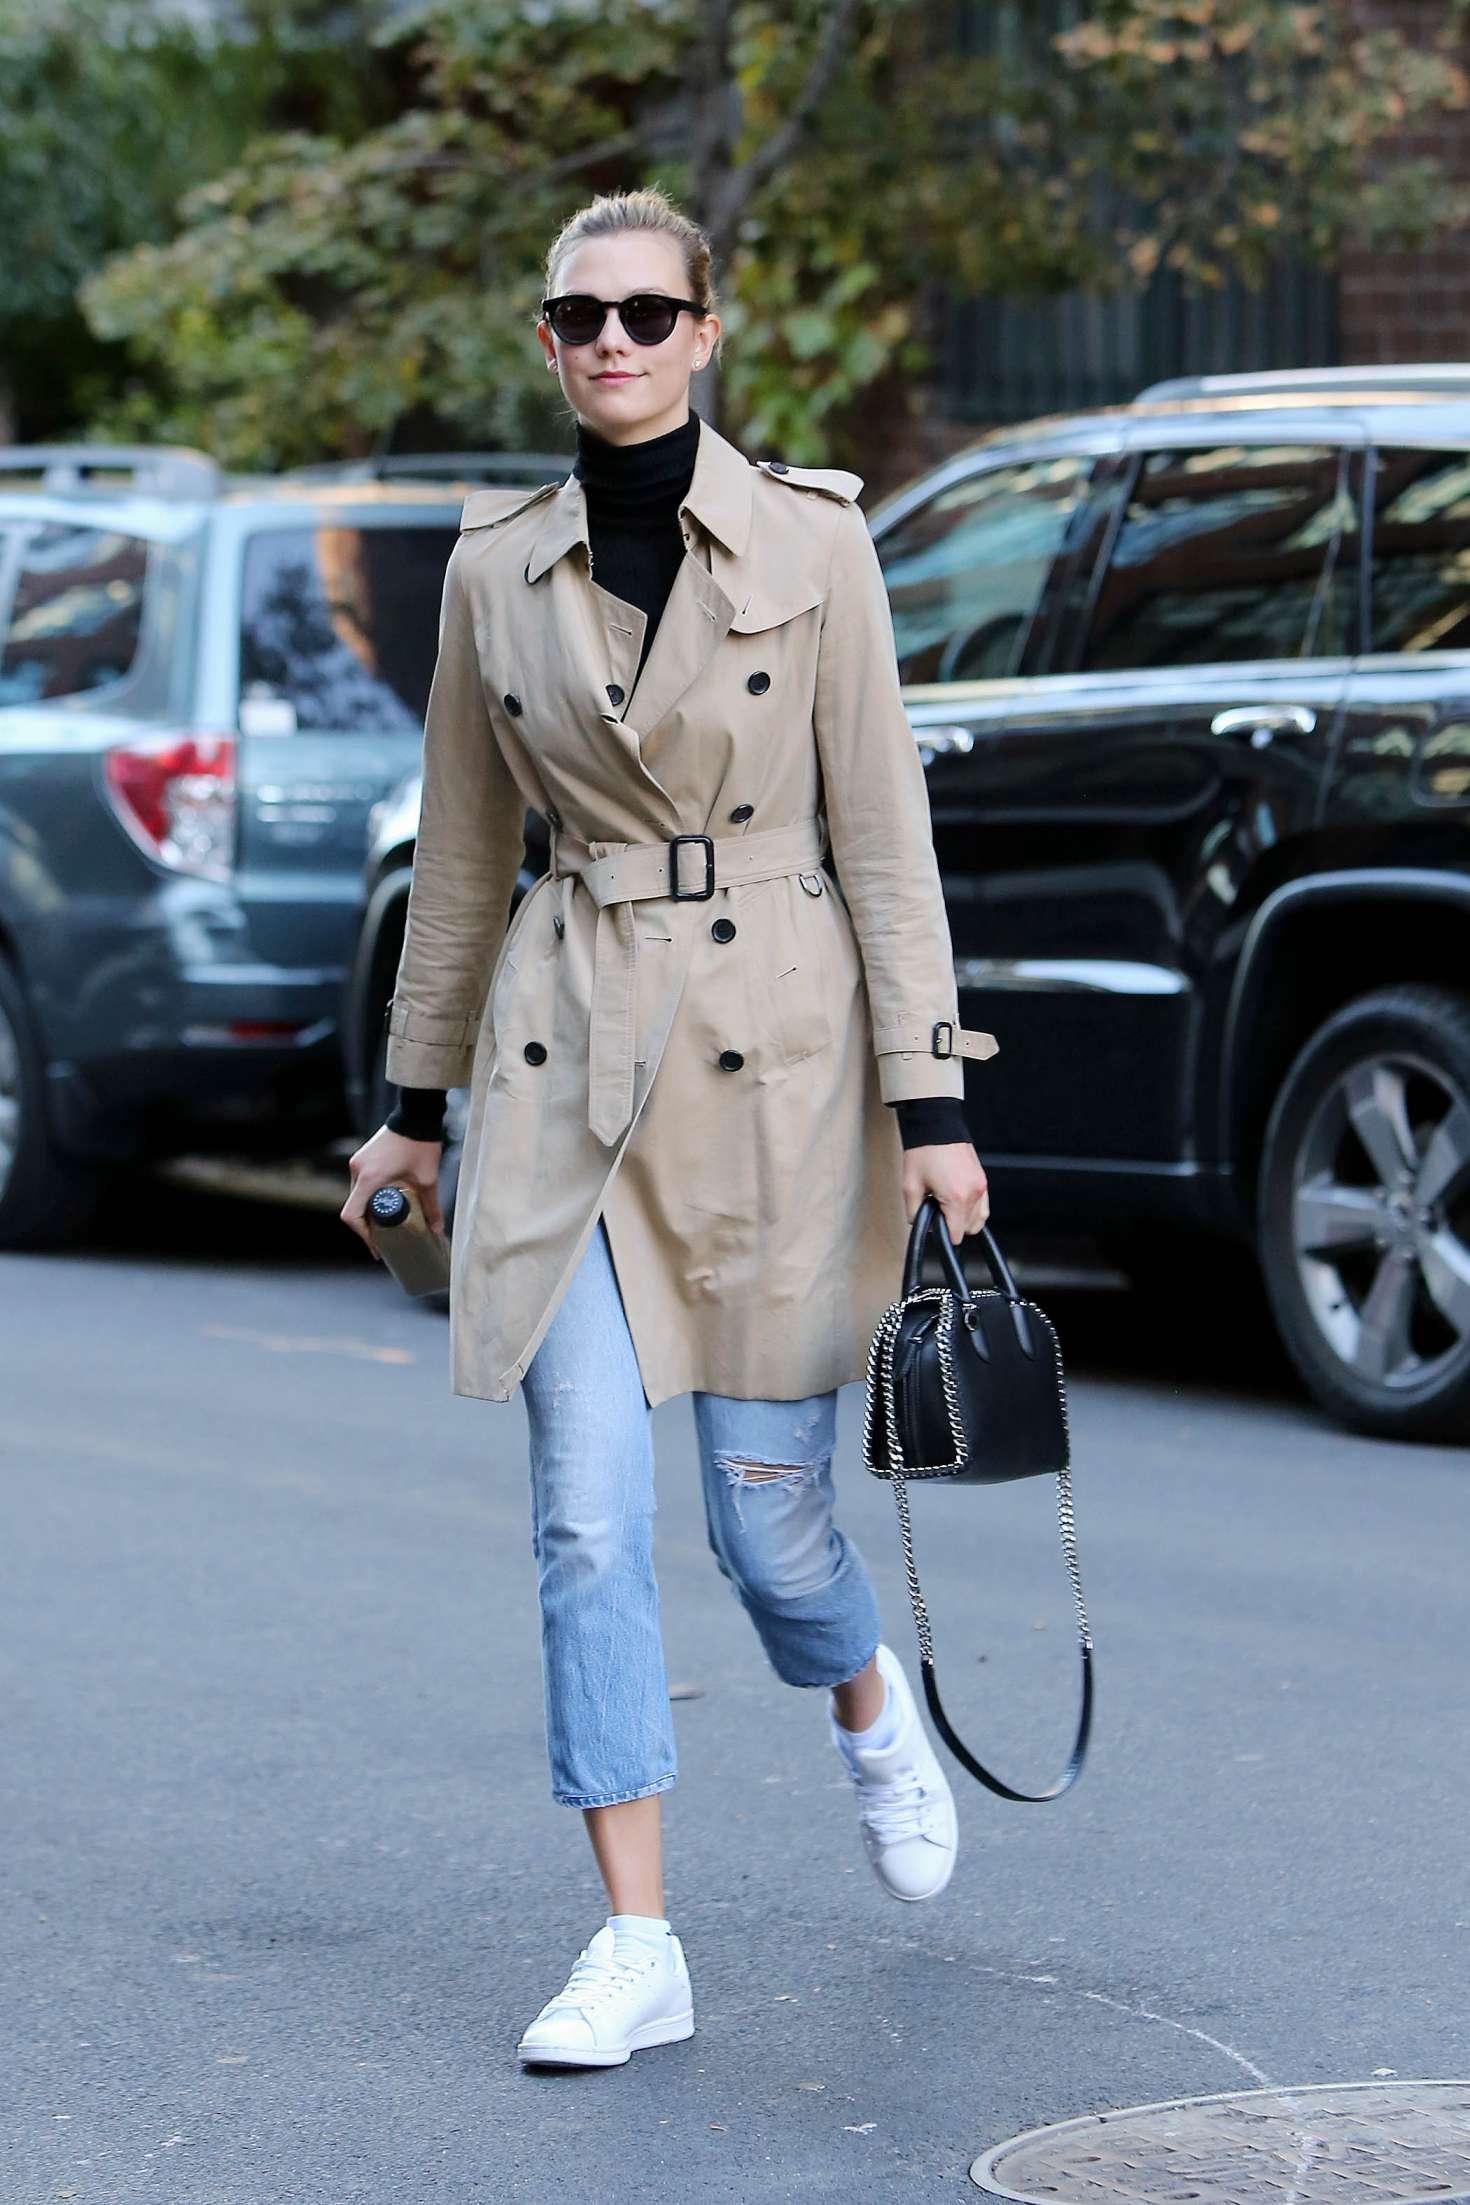 Karlie Kloss 2016 : Karlie Kloss in Jeans and Coat -06